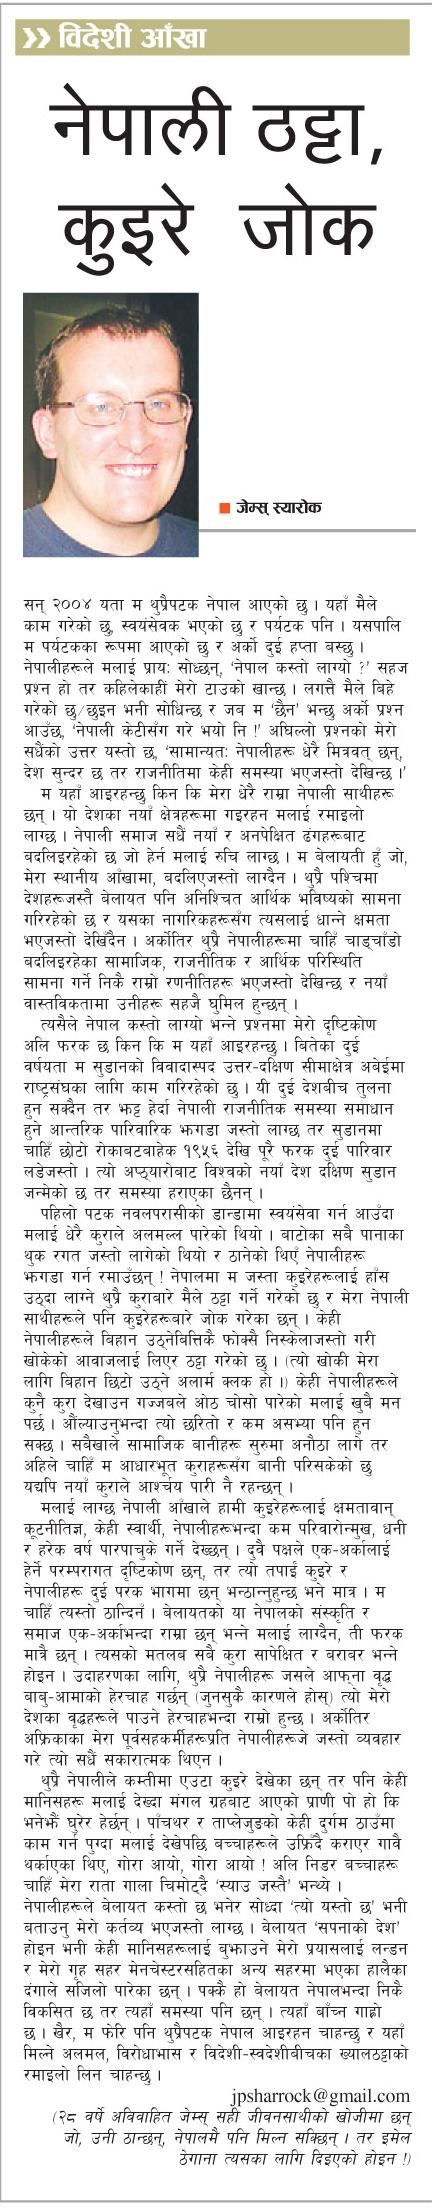 Essay on dashain festival in nepali language books